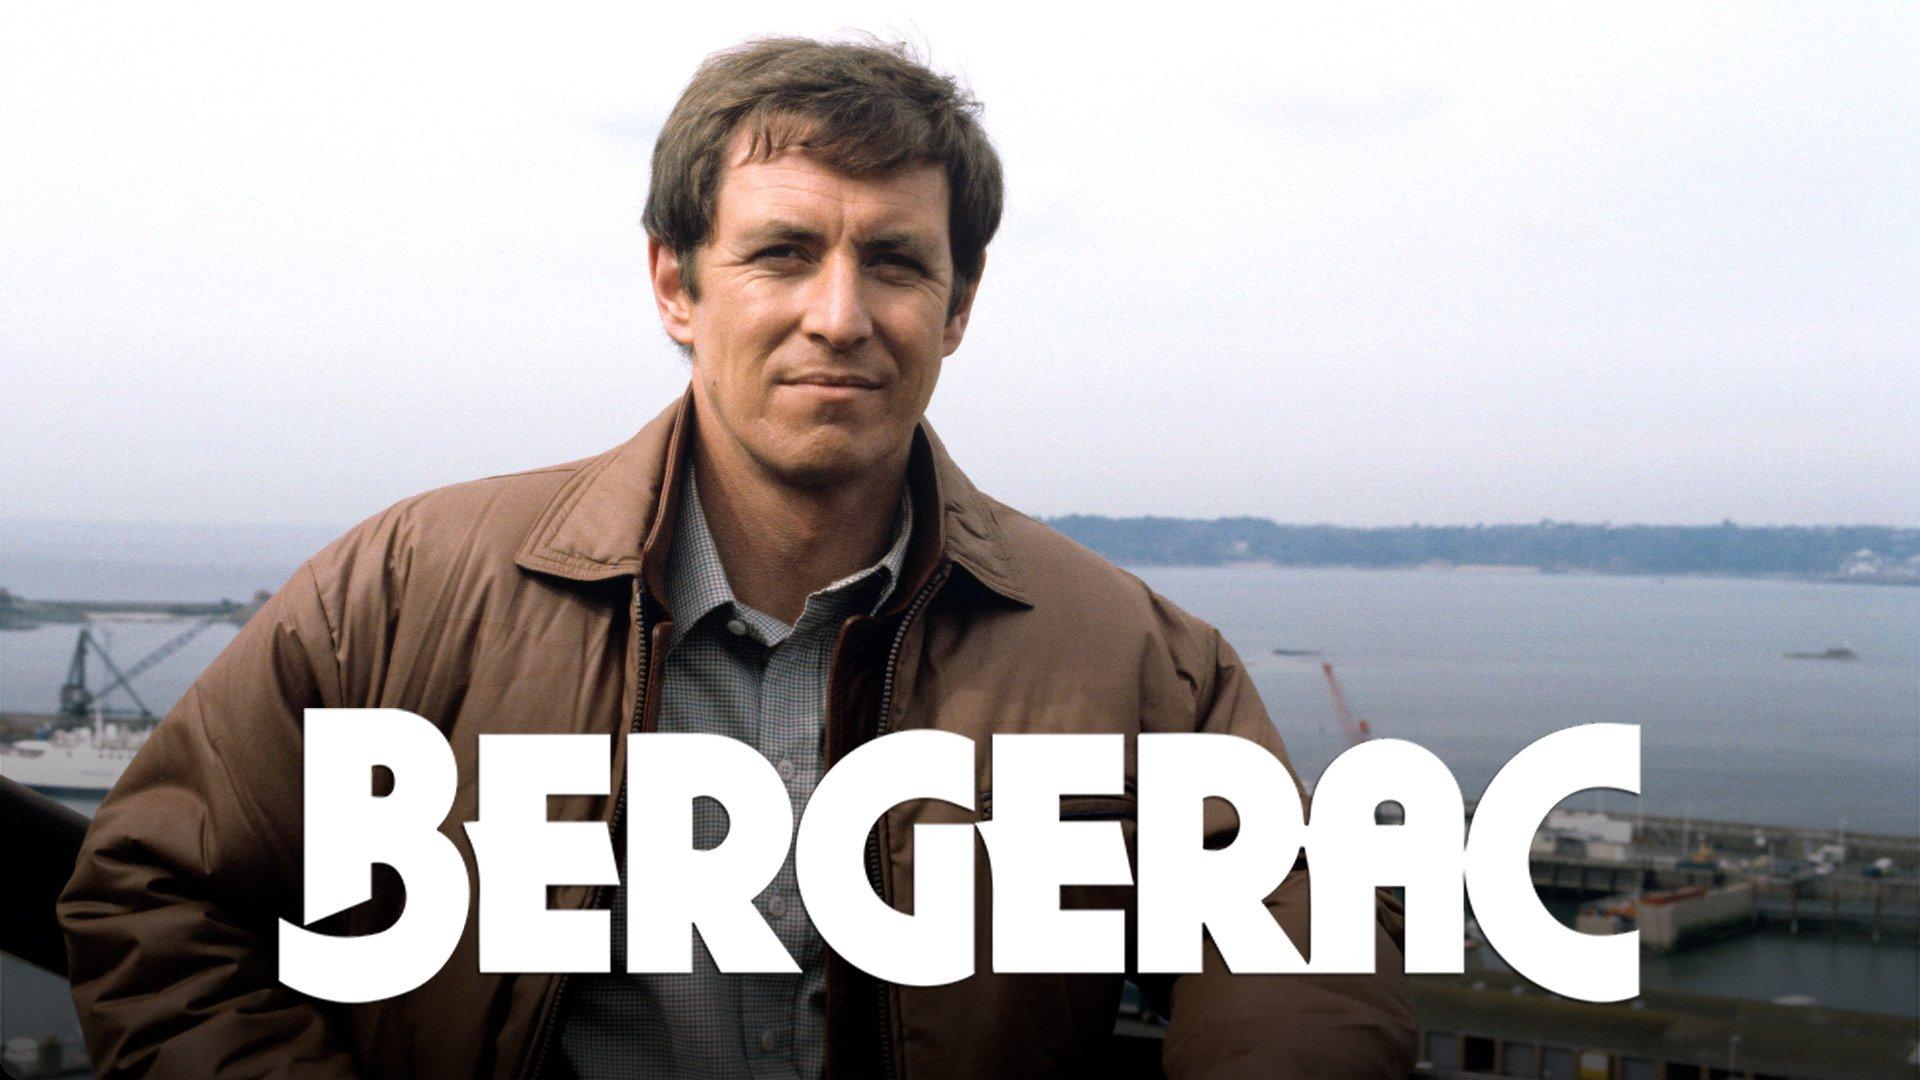 Bergerac on BritBox UK